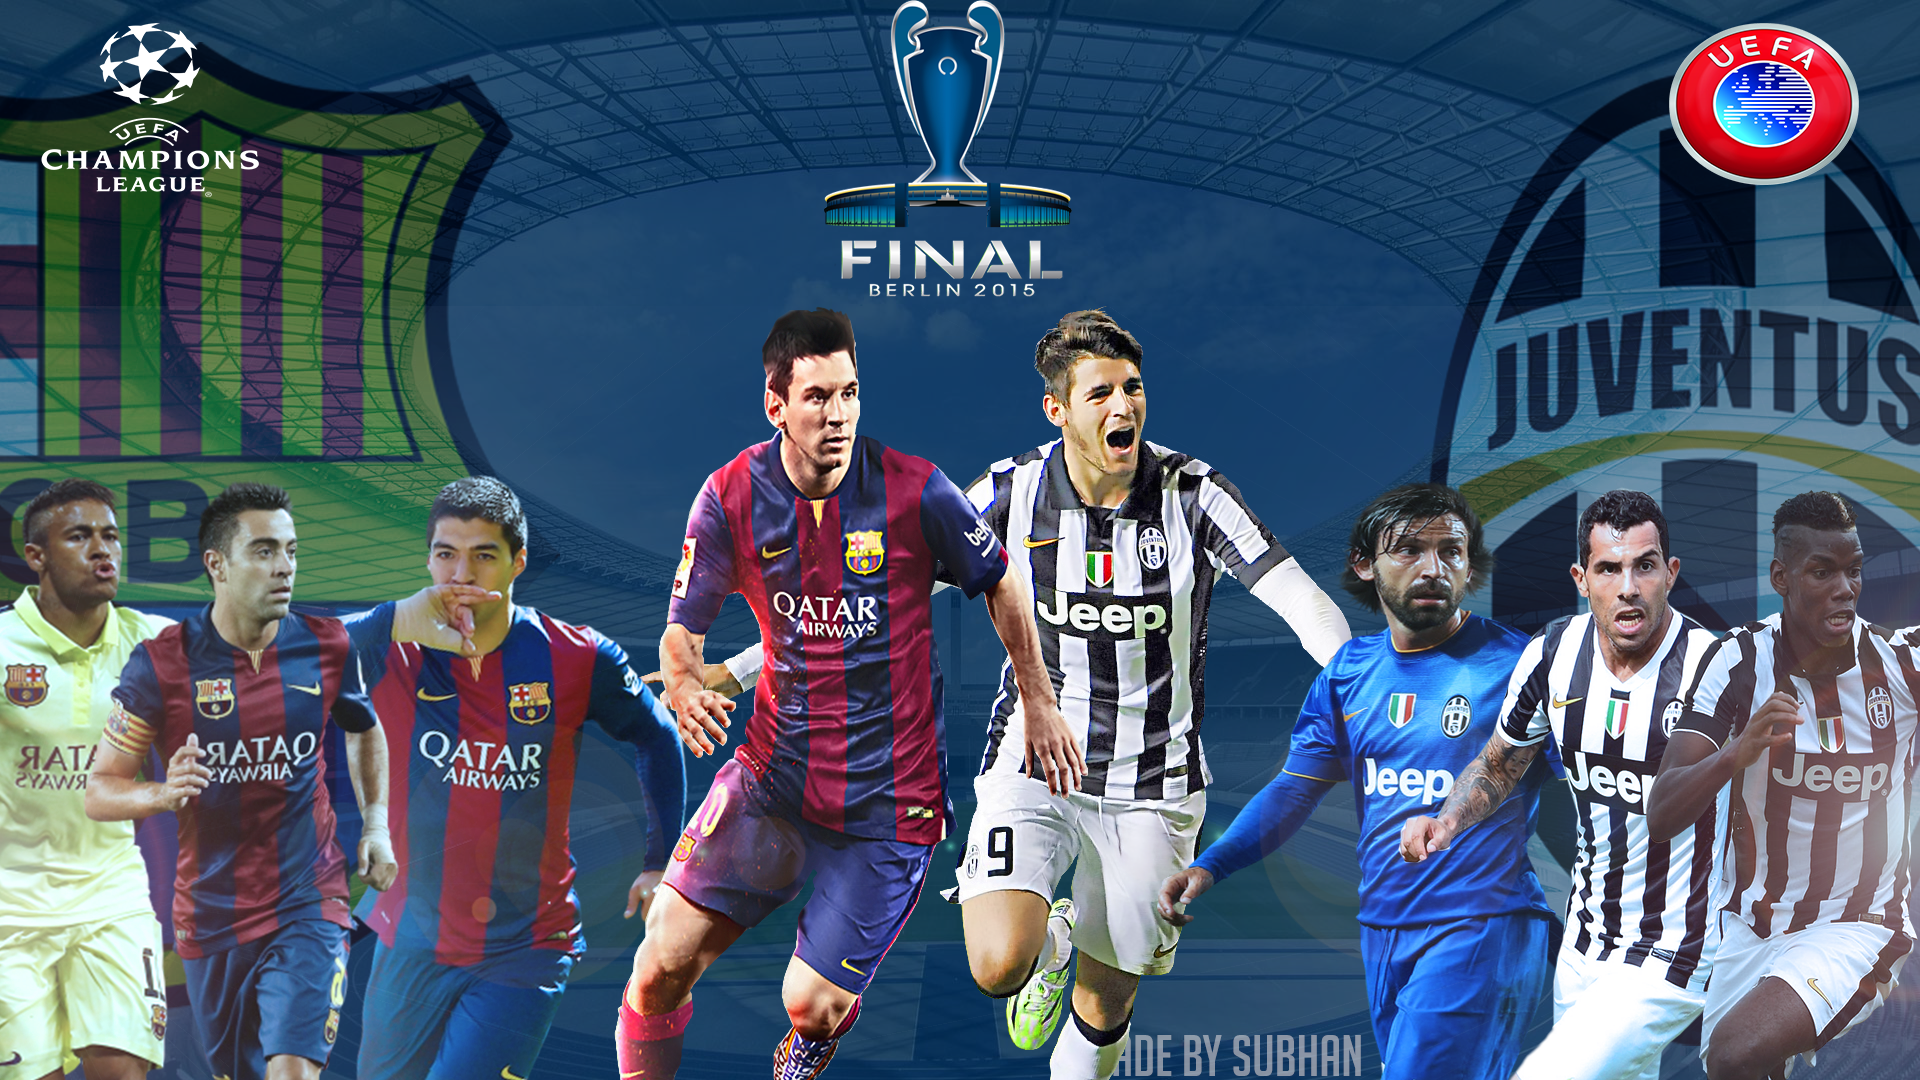 champions league final 2015 berlin 1080p wallpaper by subhan22 on deviantart champions league final 2015 berlin